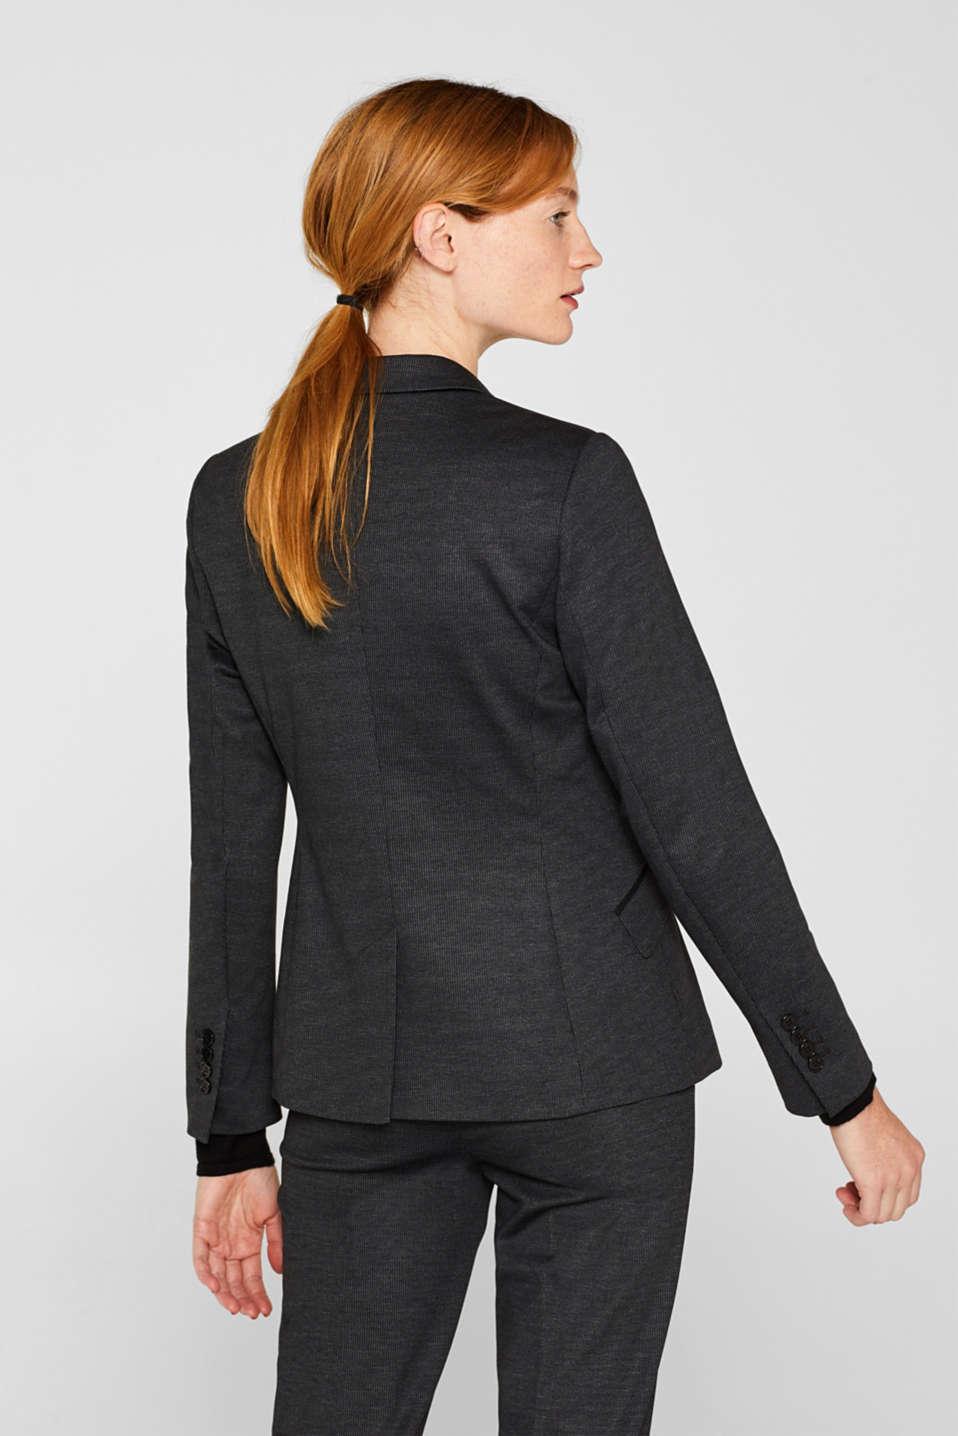 MINI CHECK mix + match stretch blazer, ANTHRACITE, detail image number 3